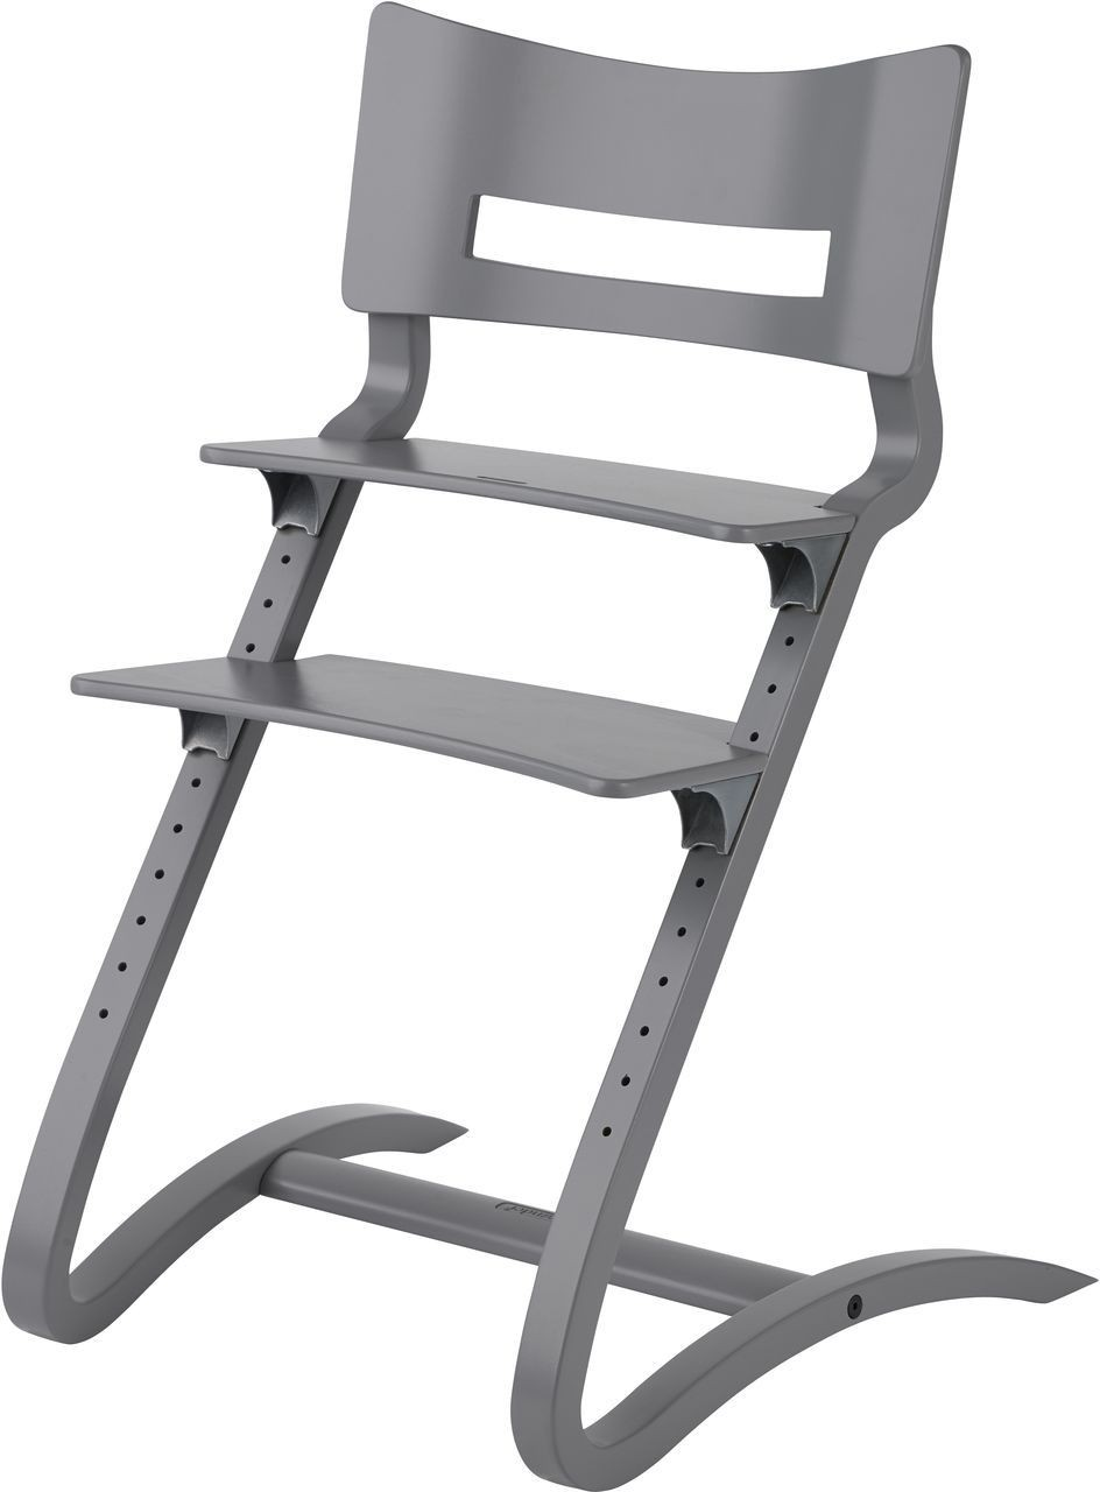 hoch stuhl cheap roba sit up iii hochstuhl vom bis zum jugendstuhl holz with hoch stuhl free. Black Bedroom Furniture Sets. Home Design Ideas